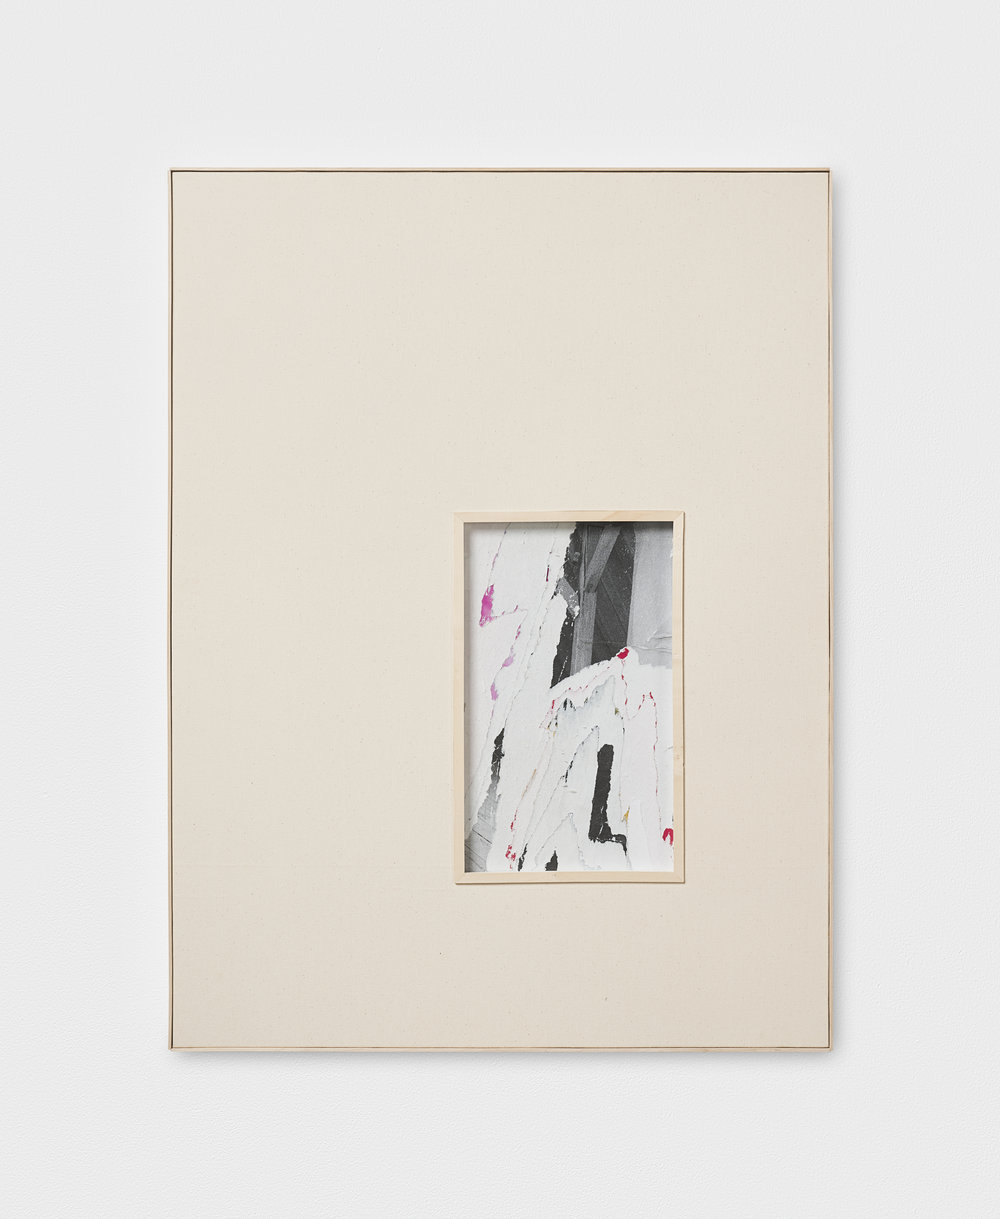 L. S. S. L. D. L' A., XX | 2016 | Leinen, Decollage hinter Glas, Künstlerrahmung | 81 x 61 x 3.5 cm | ©GALERIE ALBER